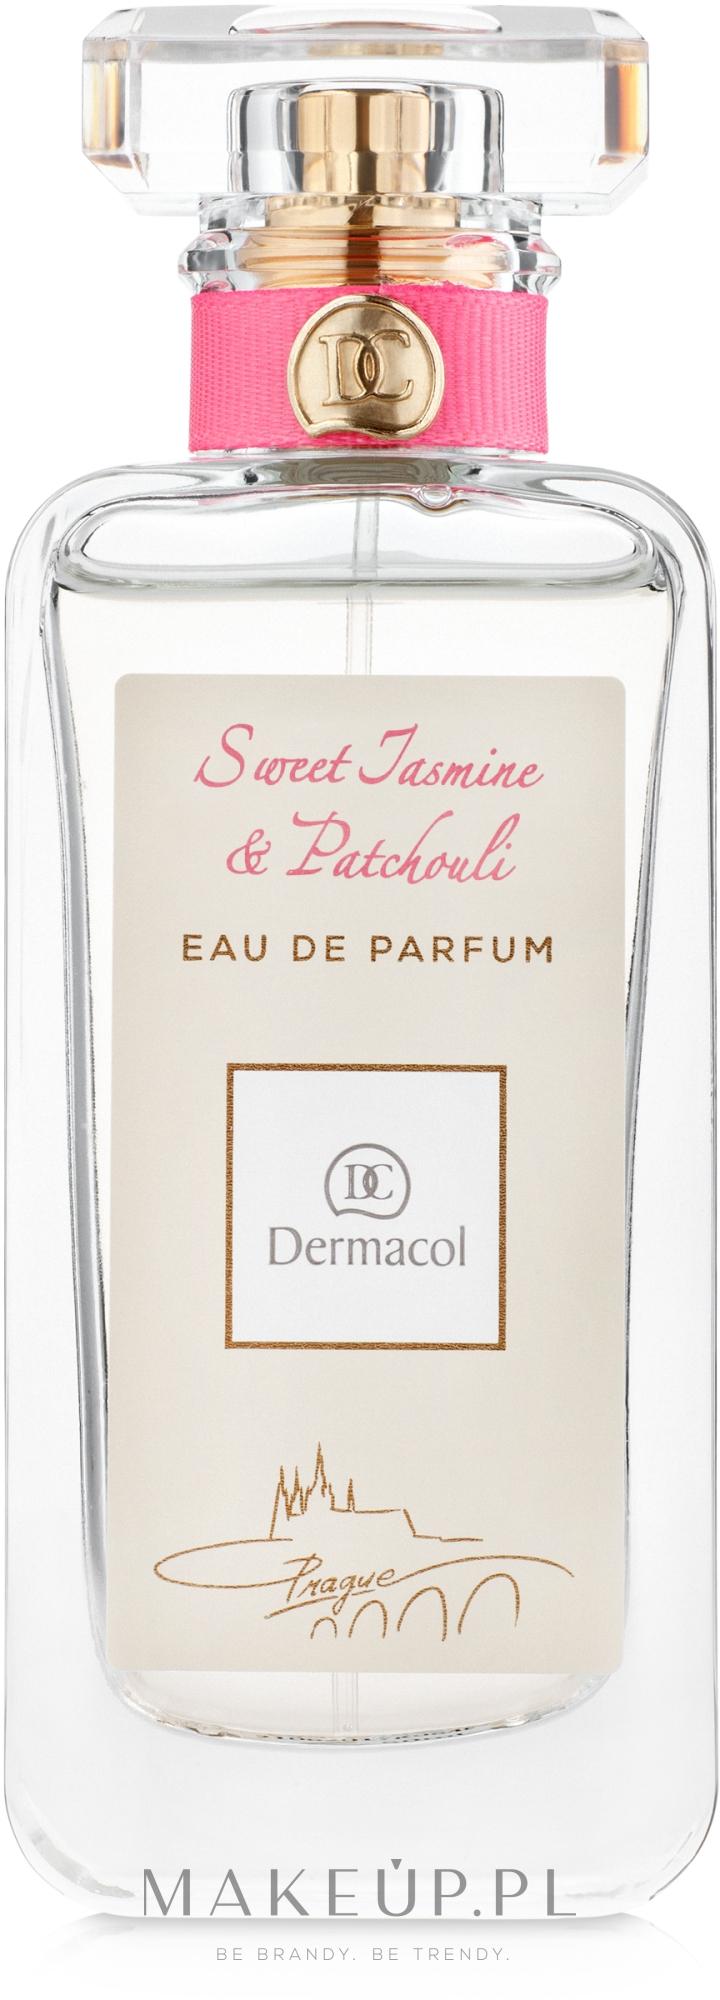 dermacol sweet jasmine & patchouli